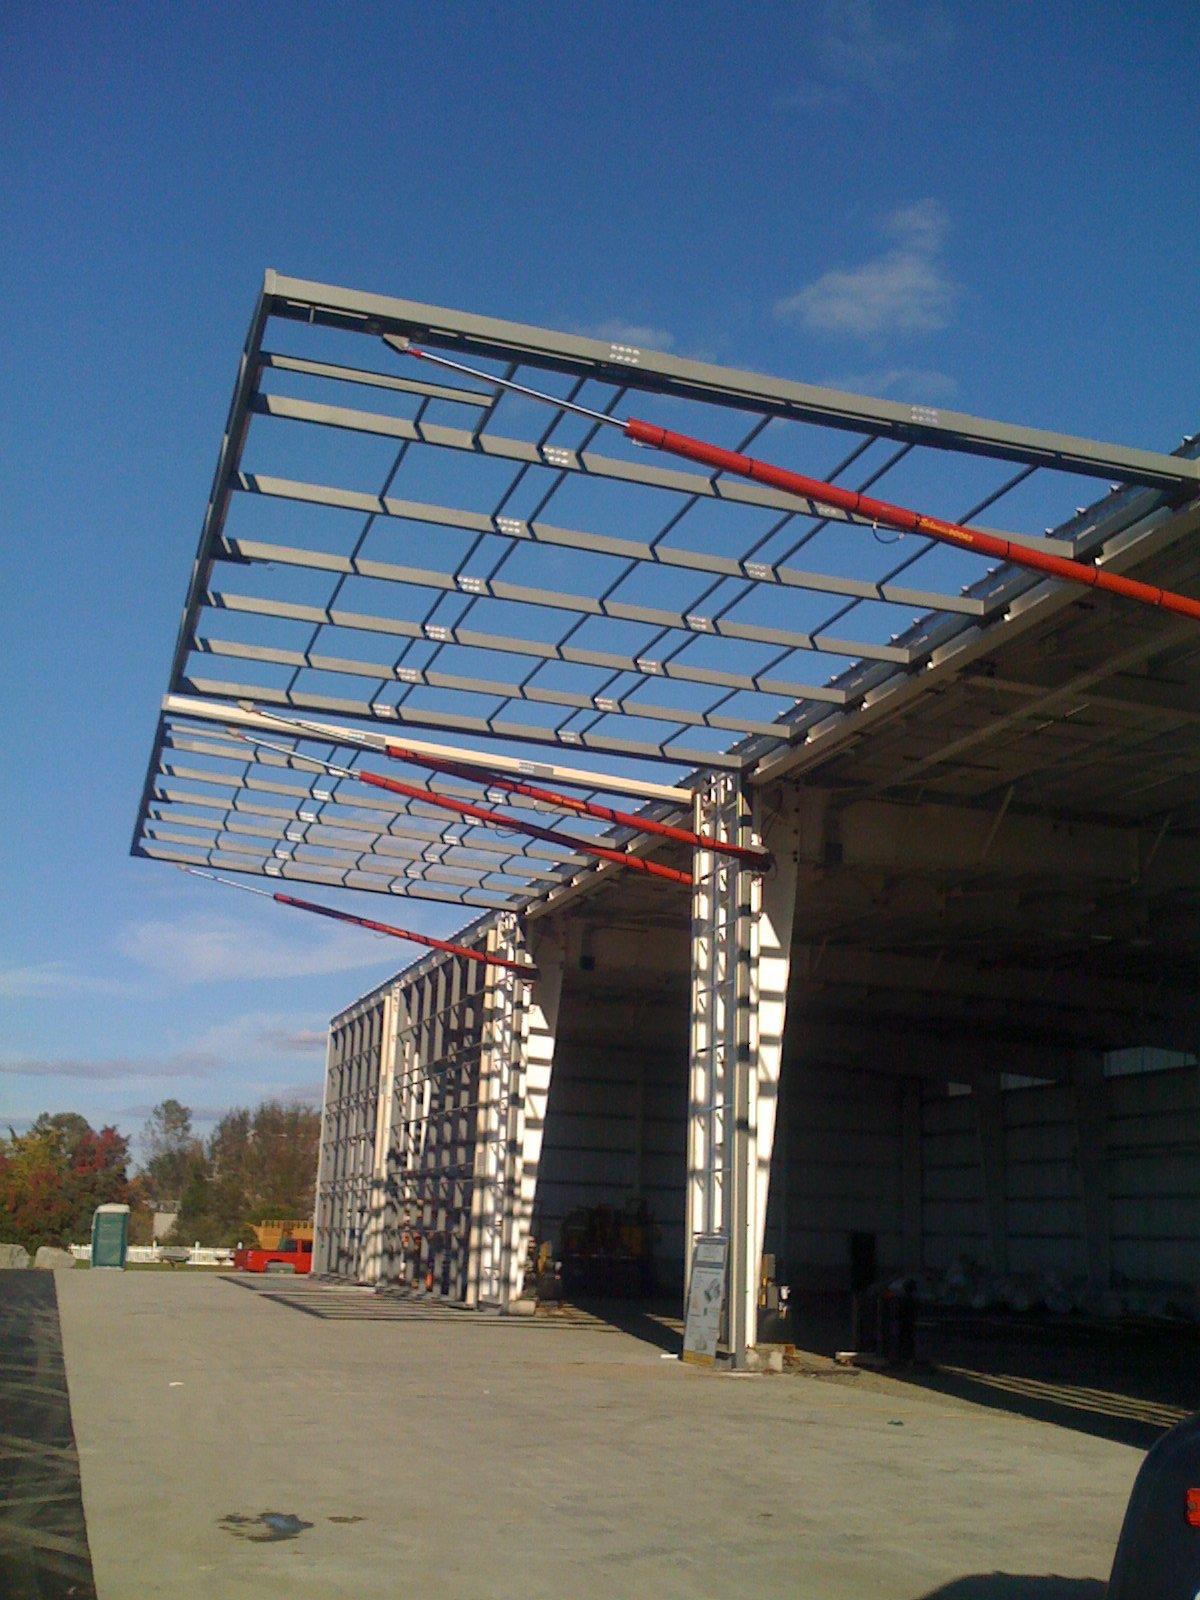 Custom Boat storage building with hydraulic doors under construction Westbrook Ct